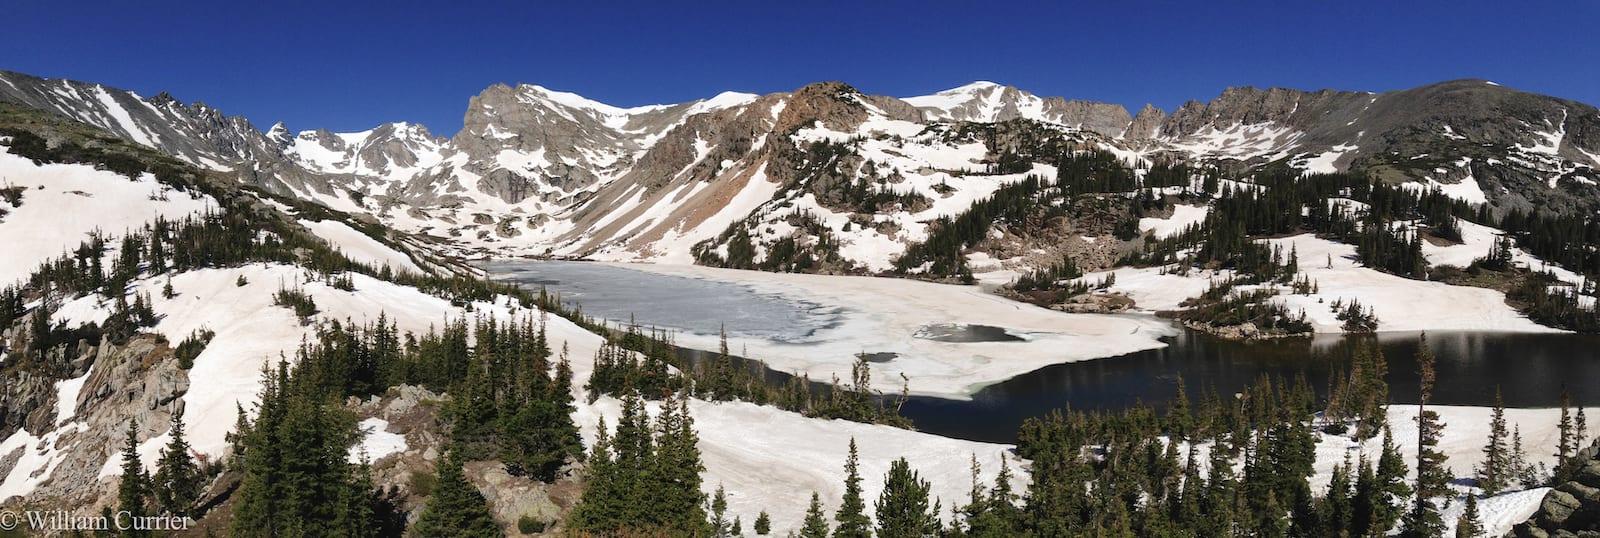 Brainard Lake, CO